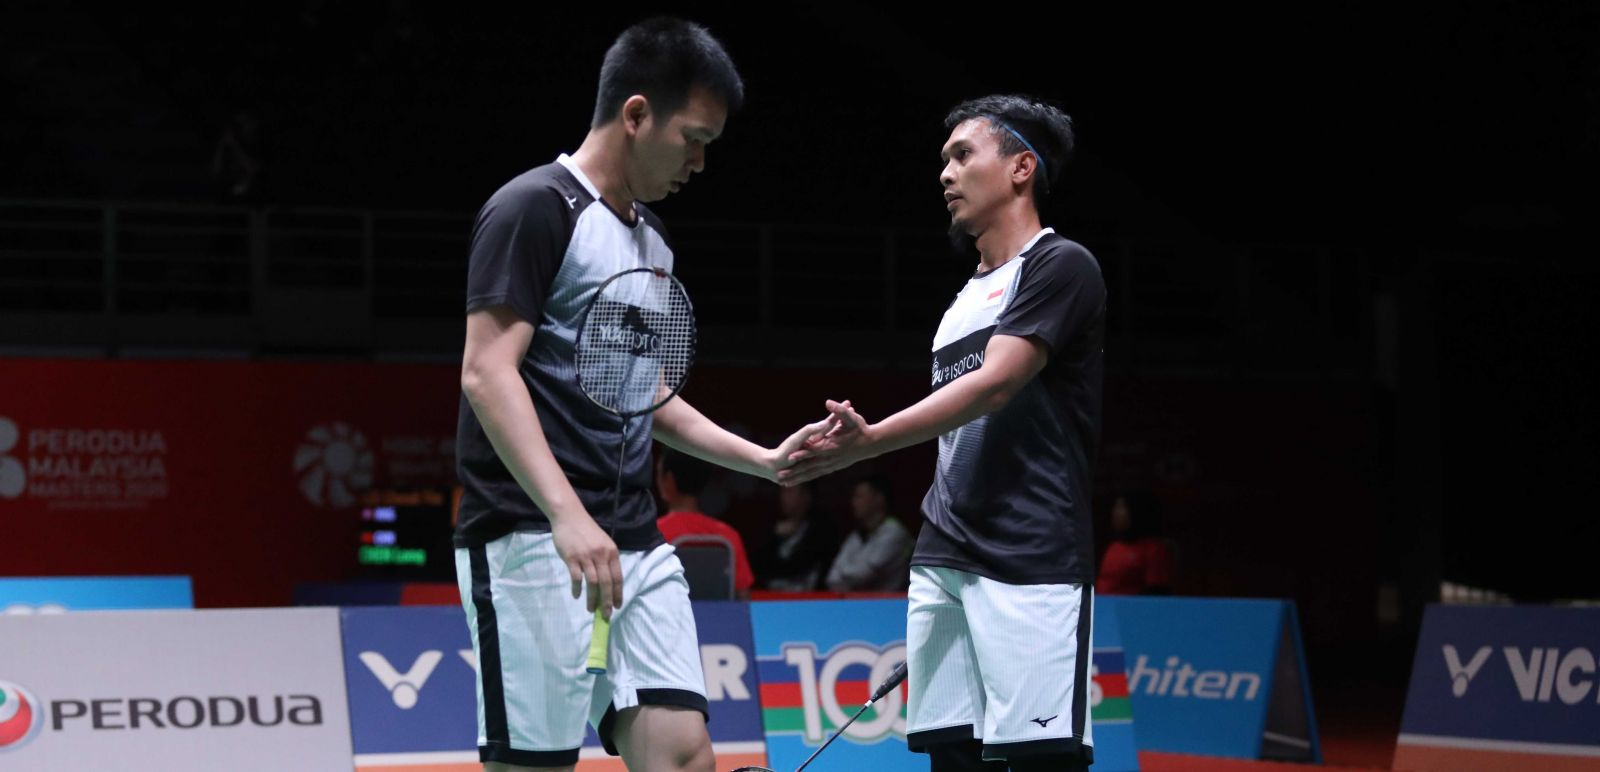 Ganda putra Mohammad Ahsan/Hendra Setiawan tidak menemui kesulitan berarti pada babak kedua Malaysia Masters 2020. Foto: PBSI